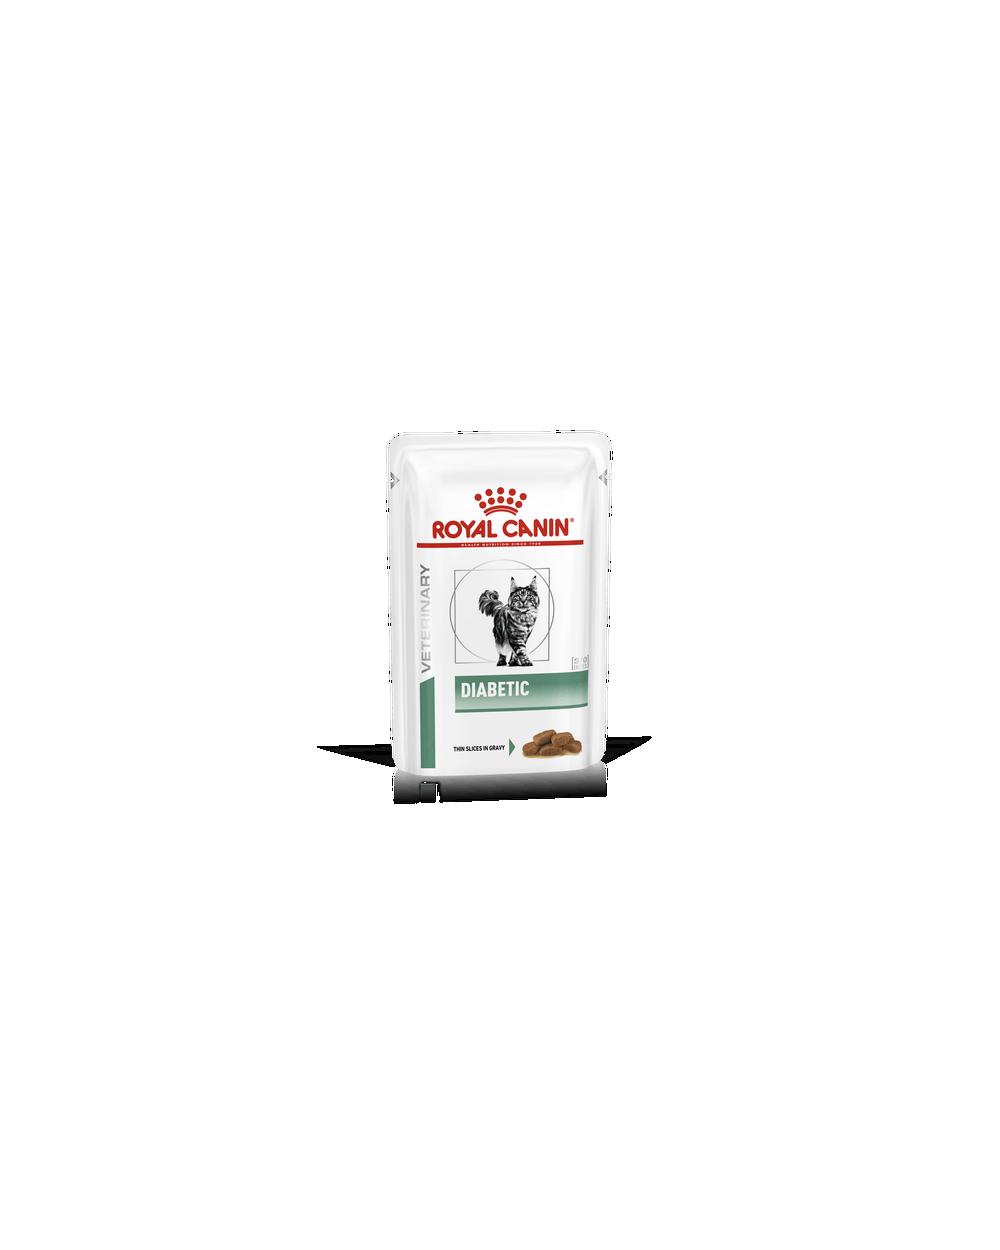 Royal Canin - Diabetic umido Feline